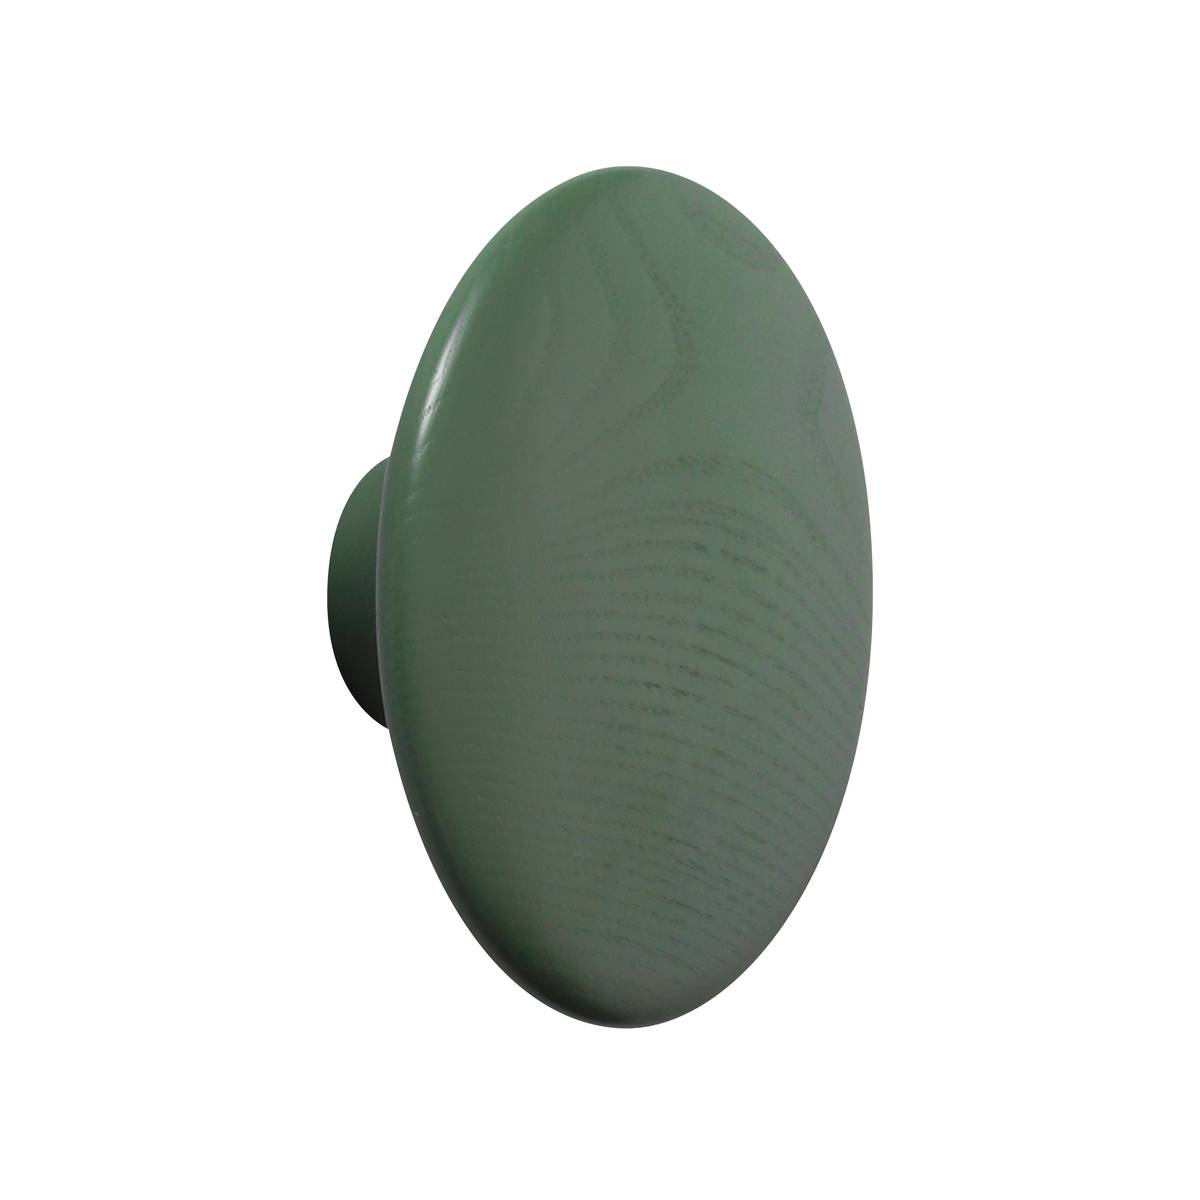 Muuto The Dots ripustin, dusty green